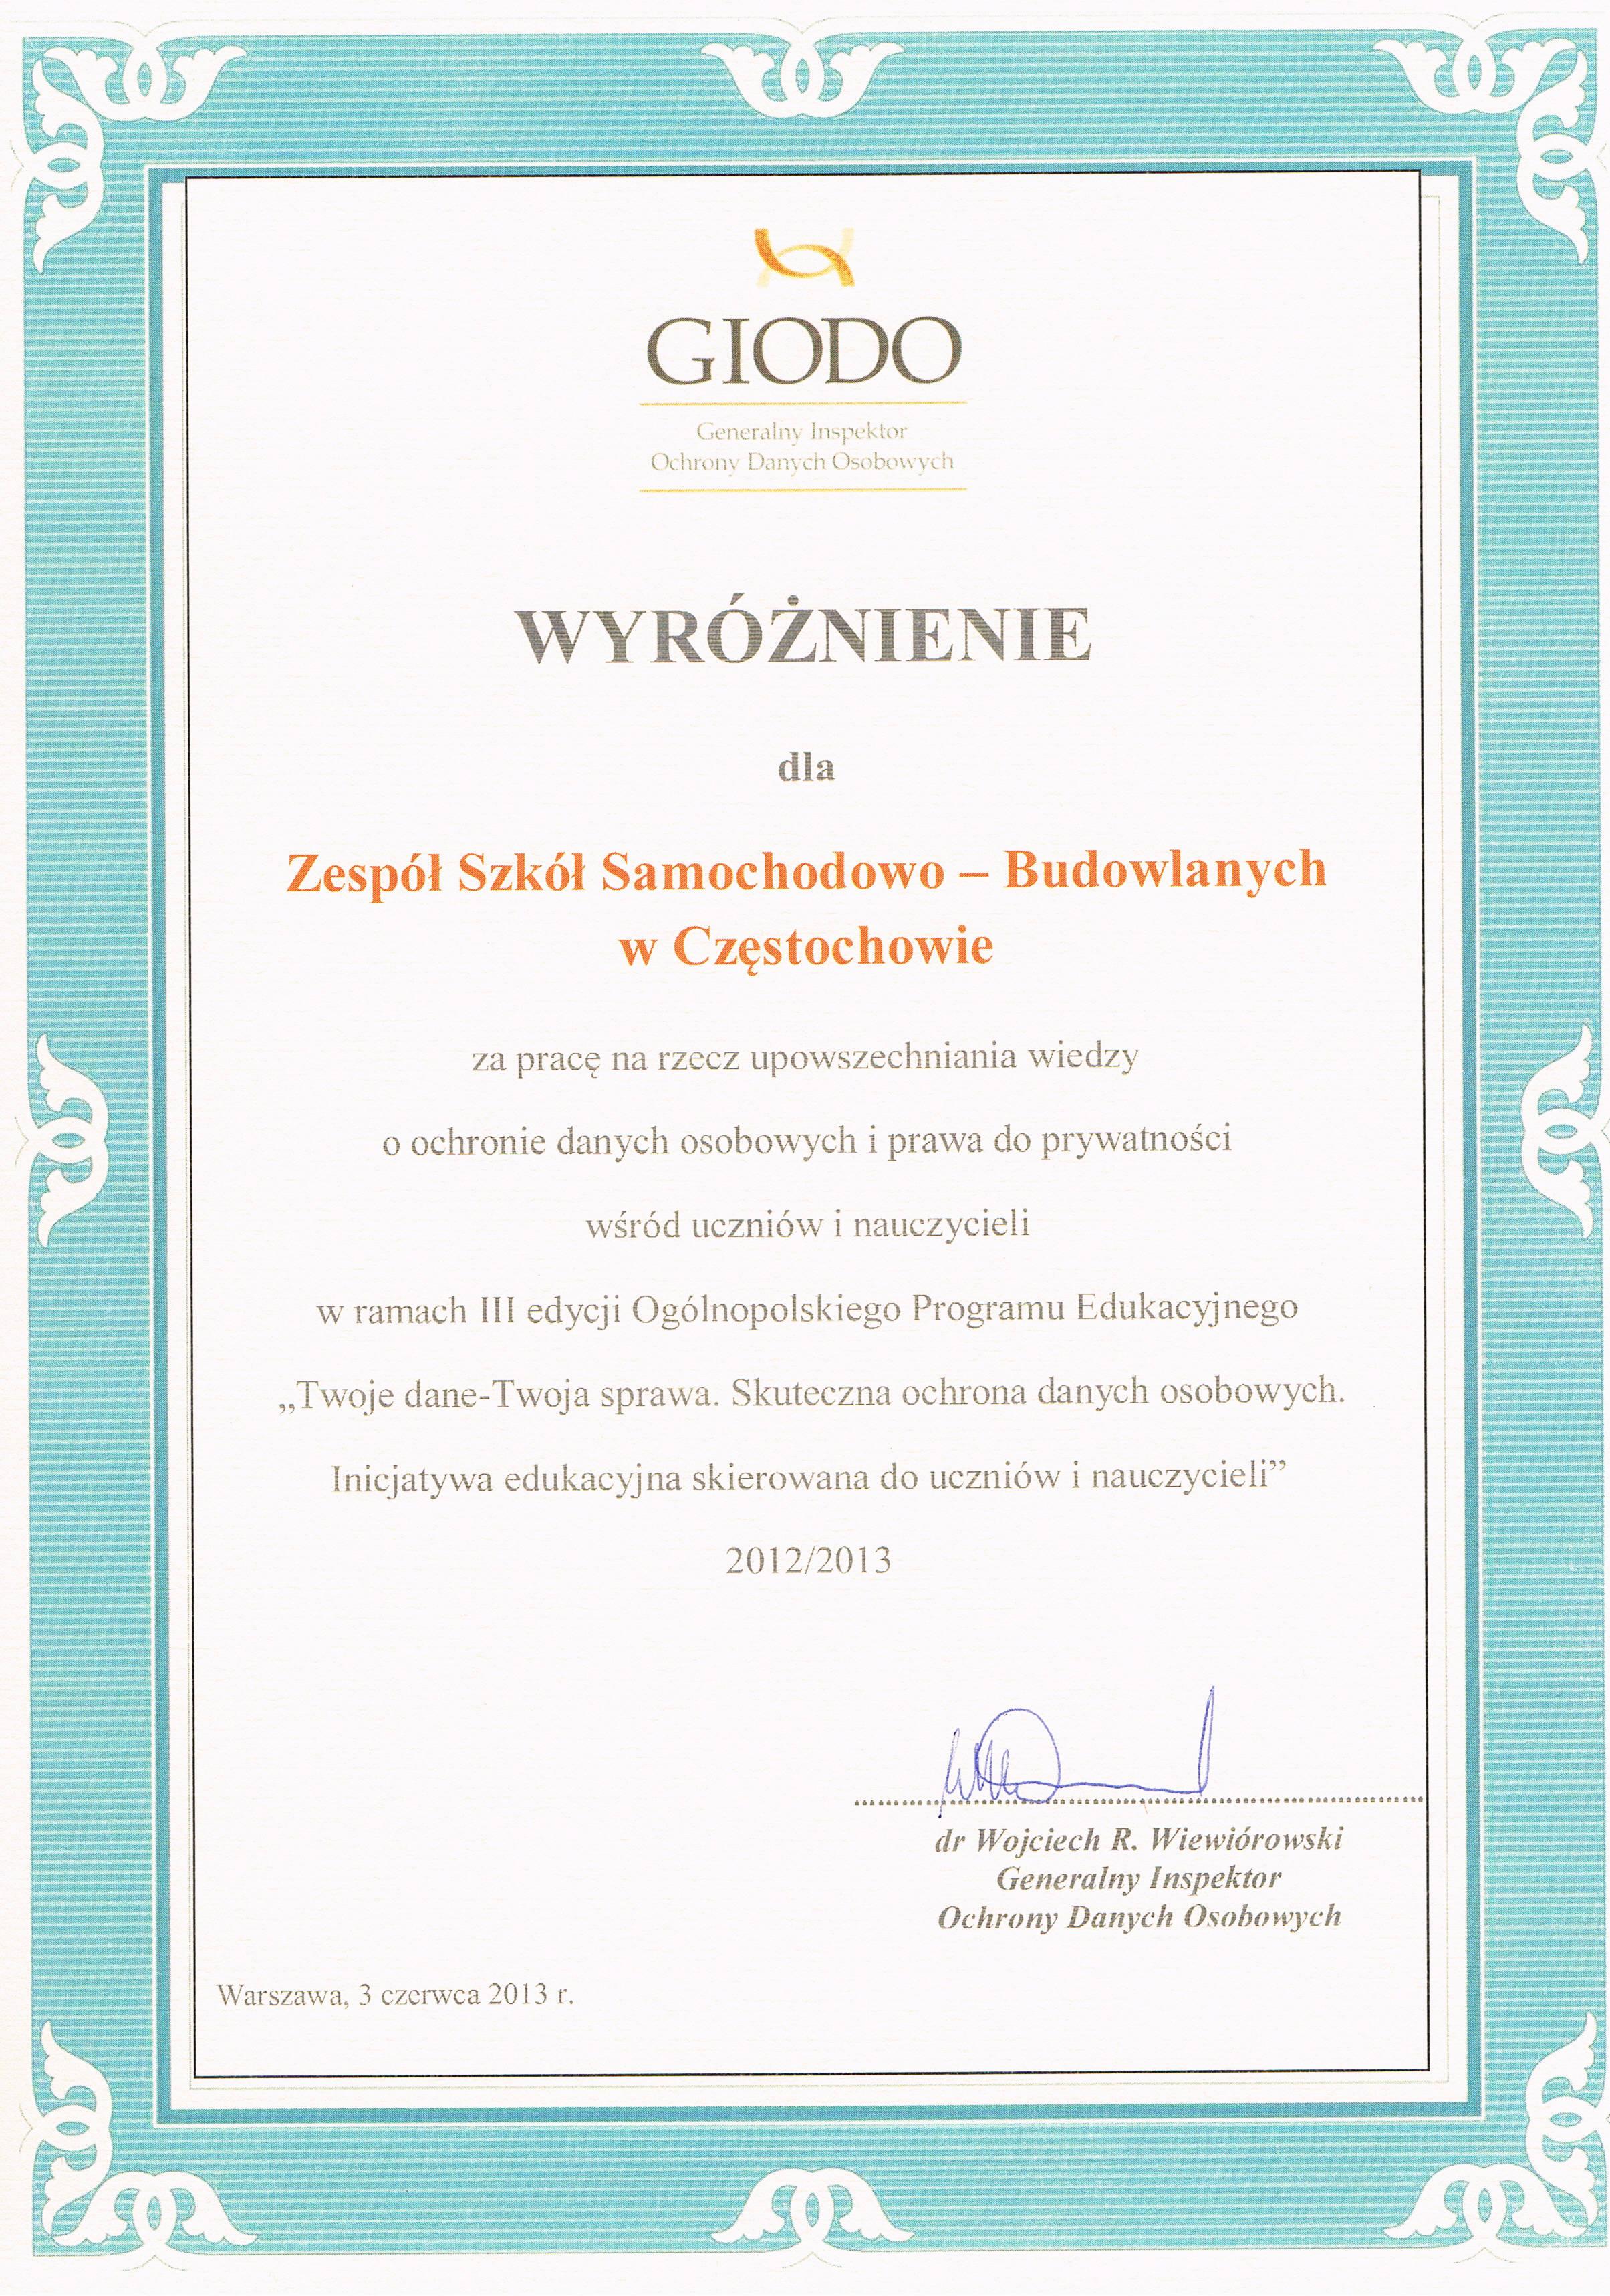 http://www.zssb.czest.szkolnastrona.pl/container///ccf20130605_00001.jpg